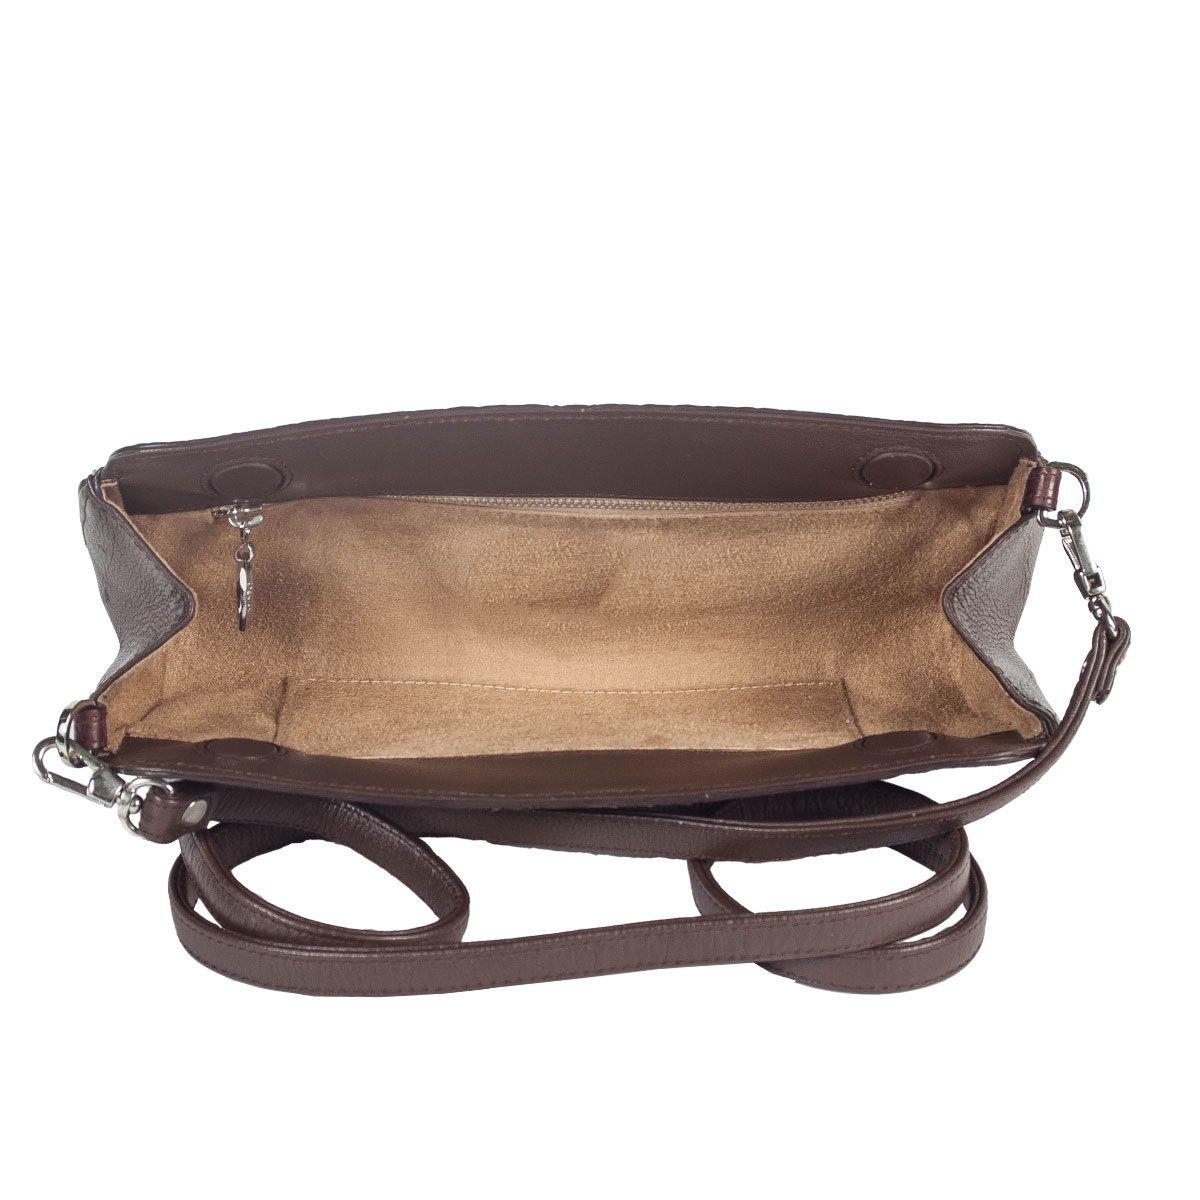 сумка BOY CHANEL, серебристый металл и кожа ягненка